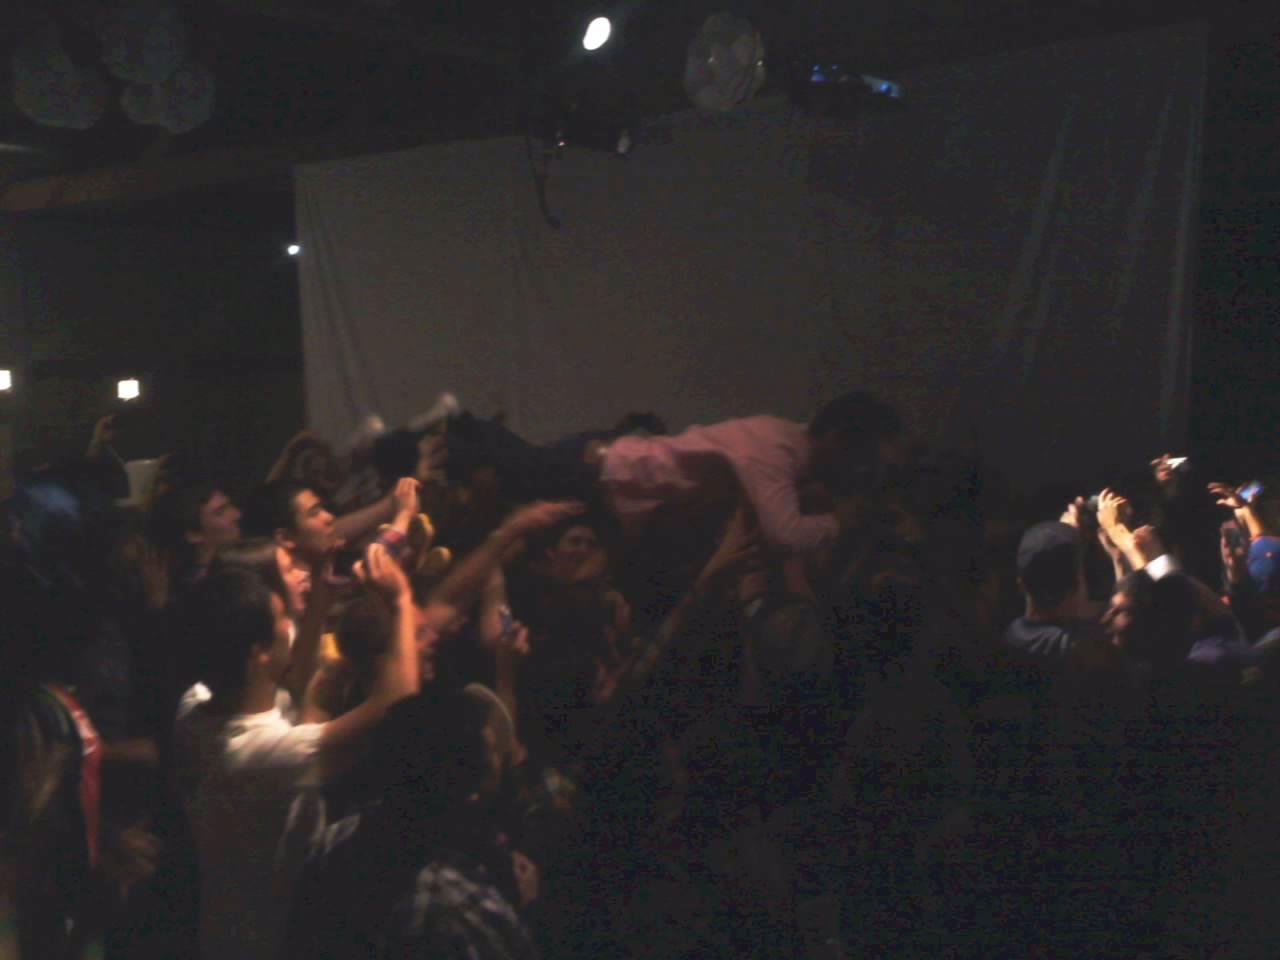 jordanloveskats: @sabzi forever crowd surfing from last night's super secret Cinemetropolis VIP Release party.